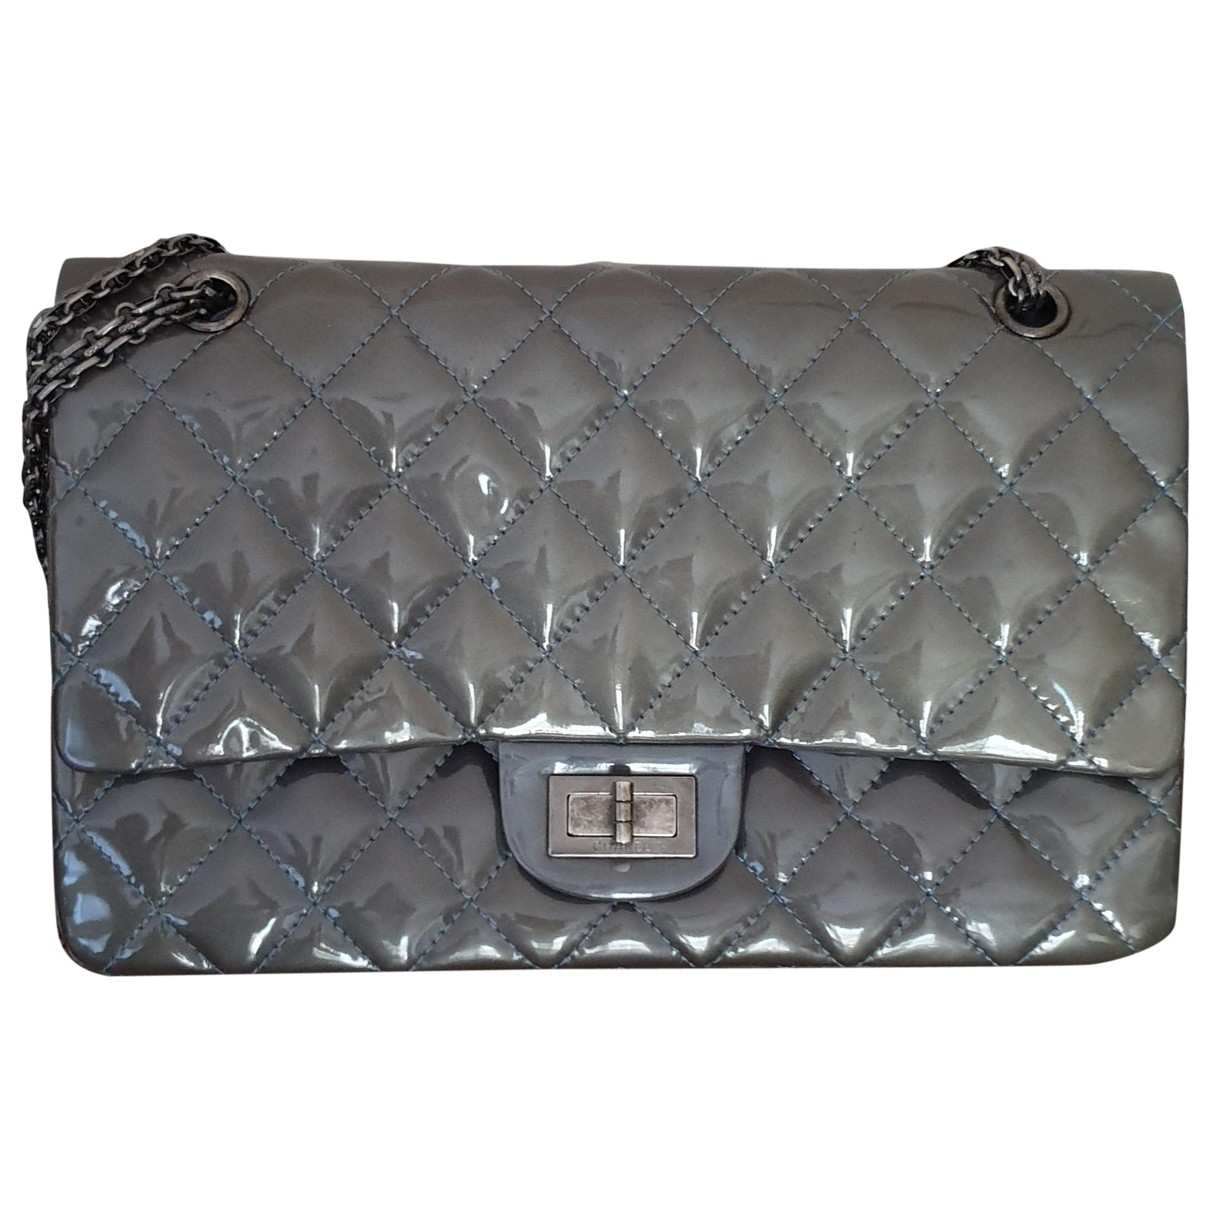 Chanel Timeless/Classique Handtasche in  Grau Lackleder